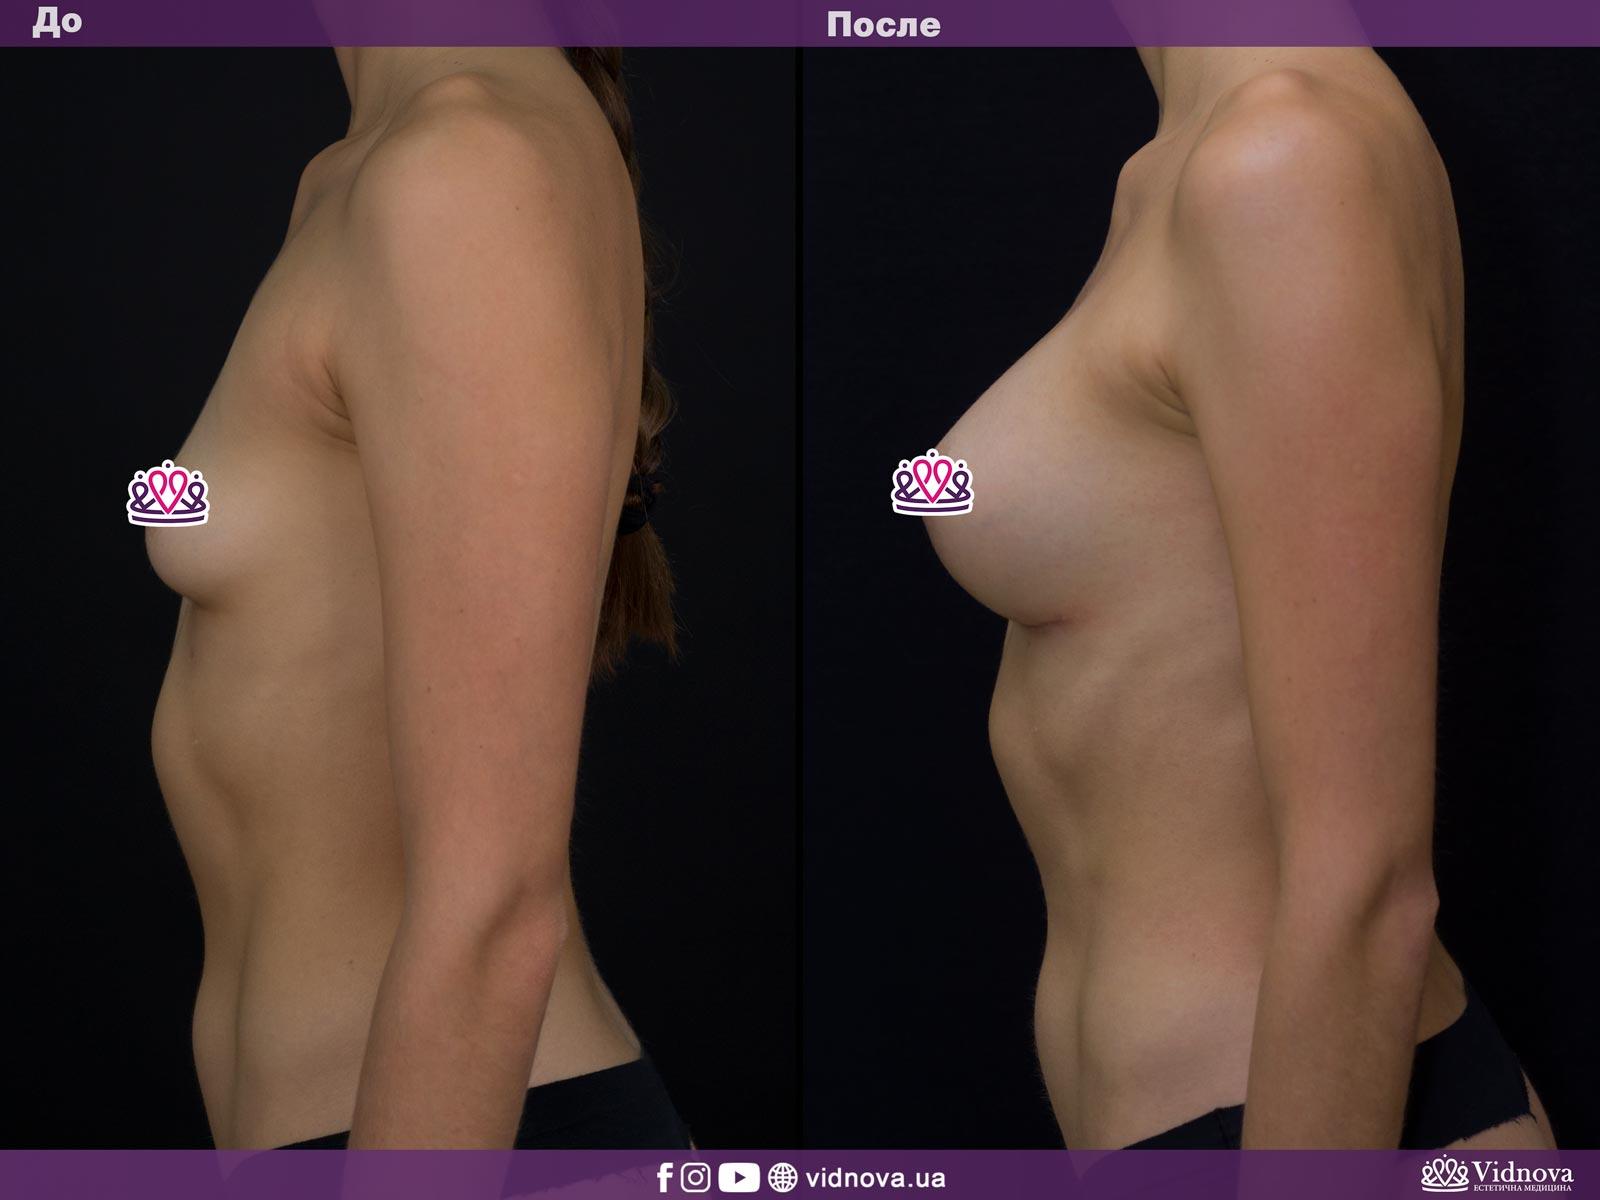 Увеличение груди: Фото ДО и ПОСЛЕ - Пример №2-3 - Клиника Vidnova